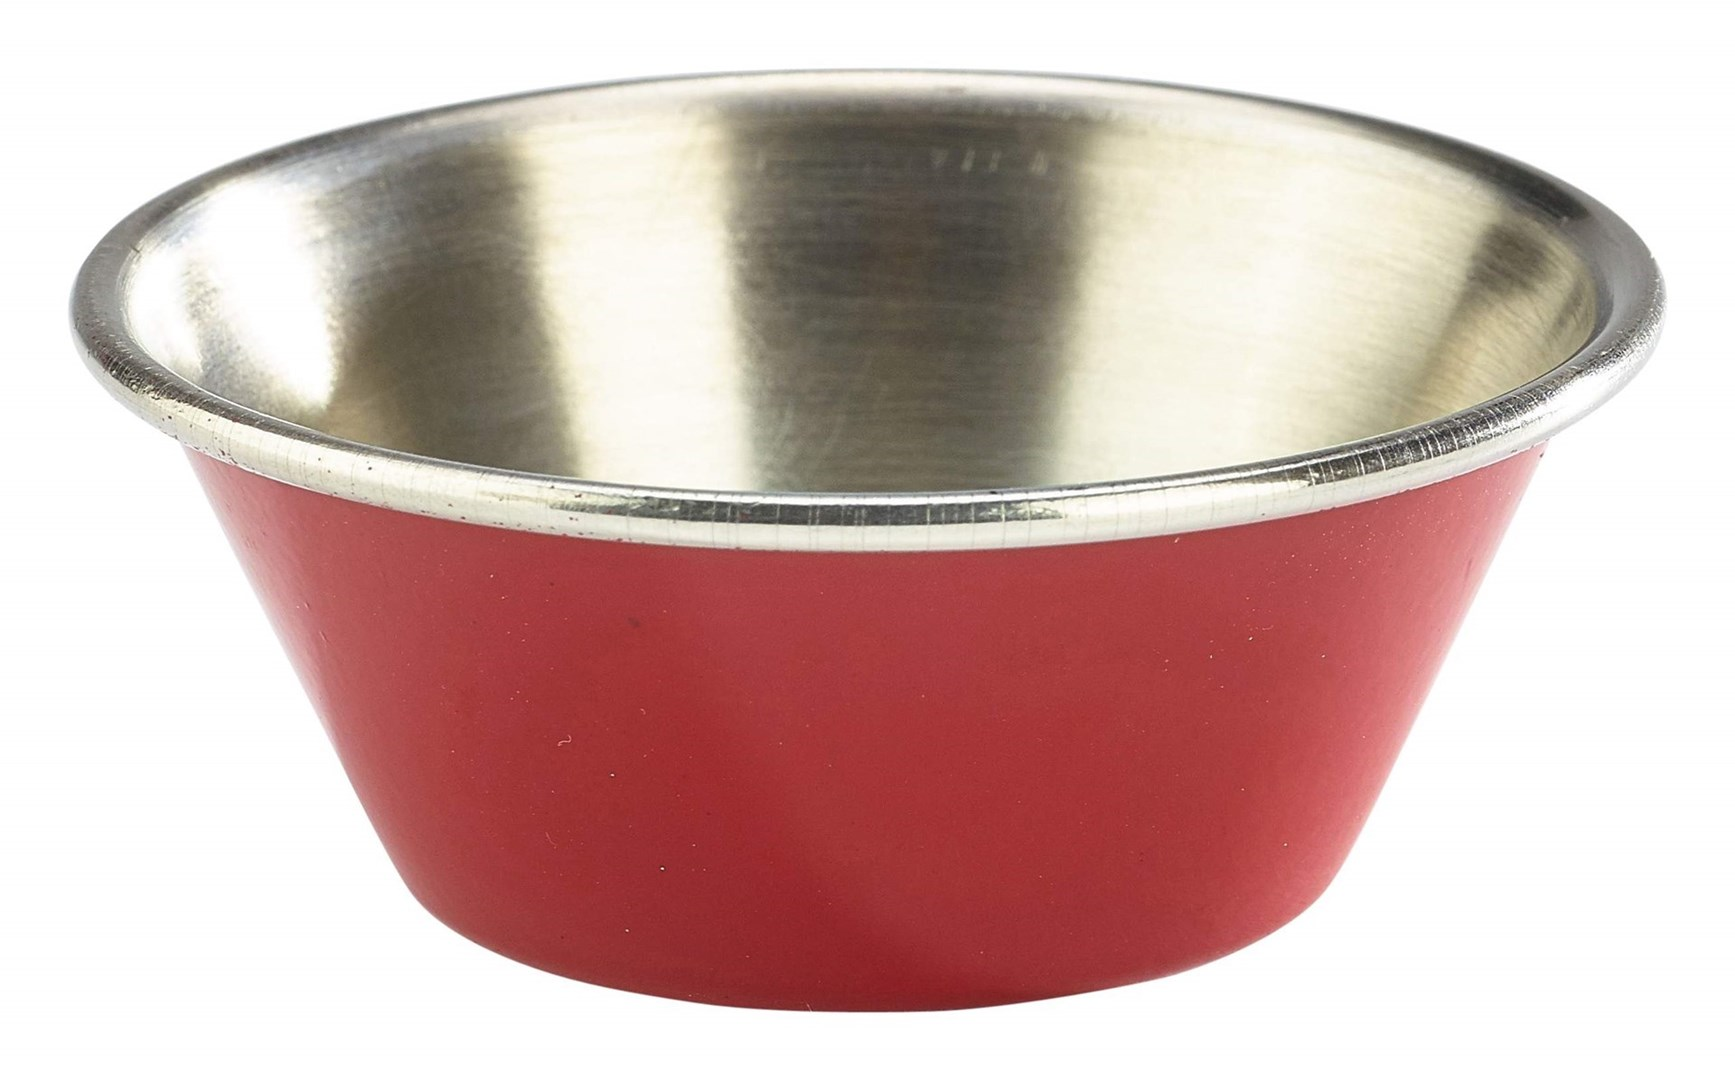 Productafbeelding RVS ramekin glad rood 43 ml